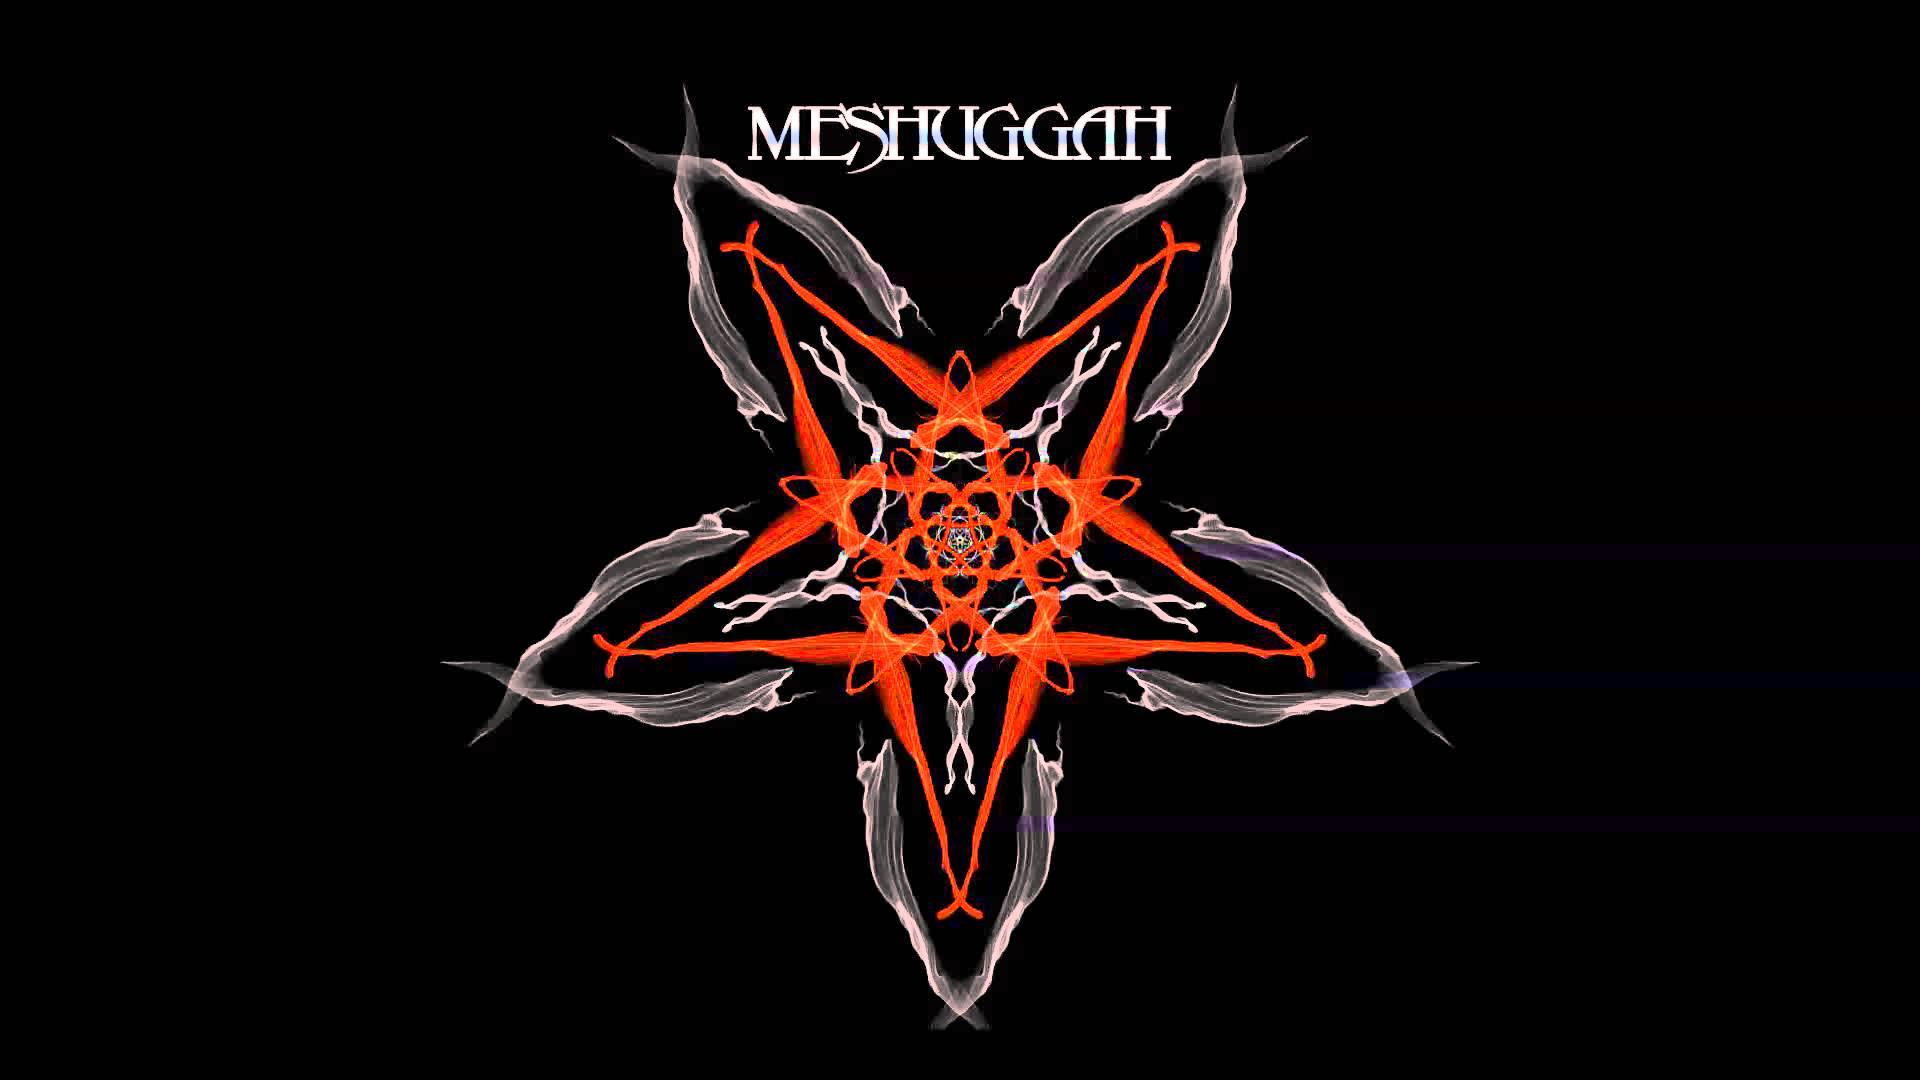 Free Download Meshuggah Obzen Wallpaper Wwwgalleryhipcom The